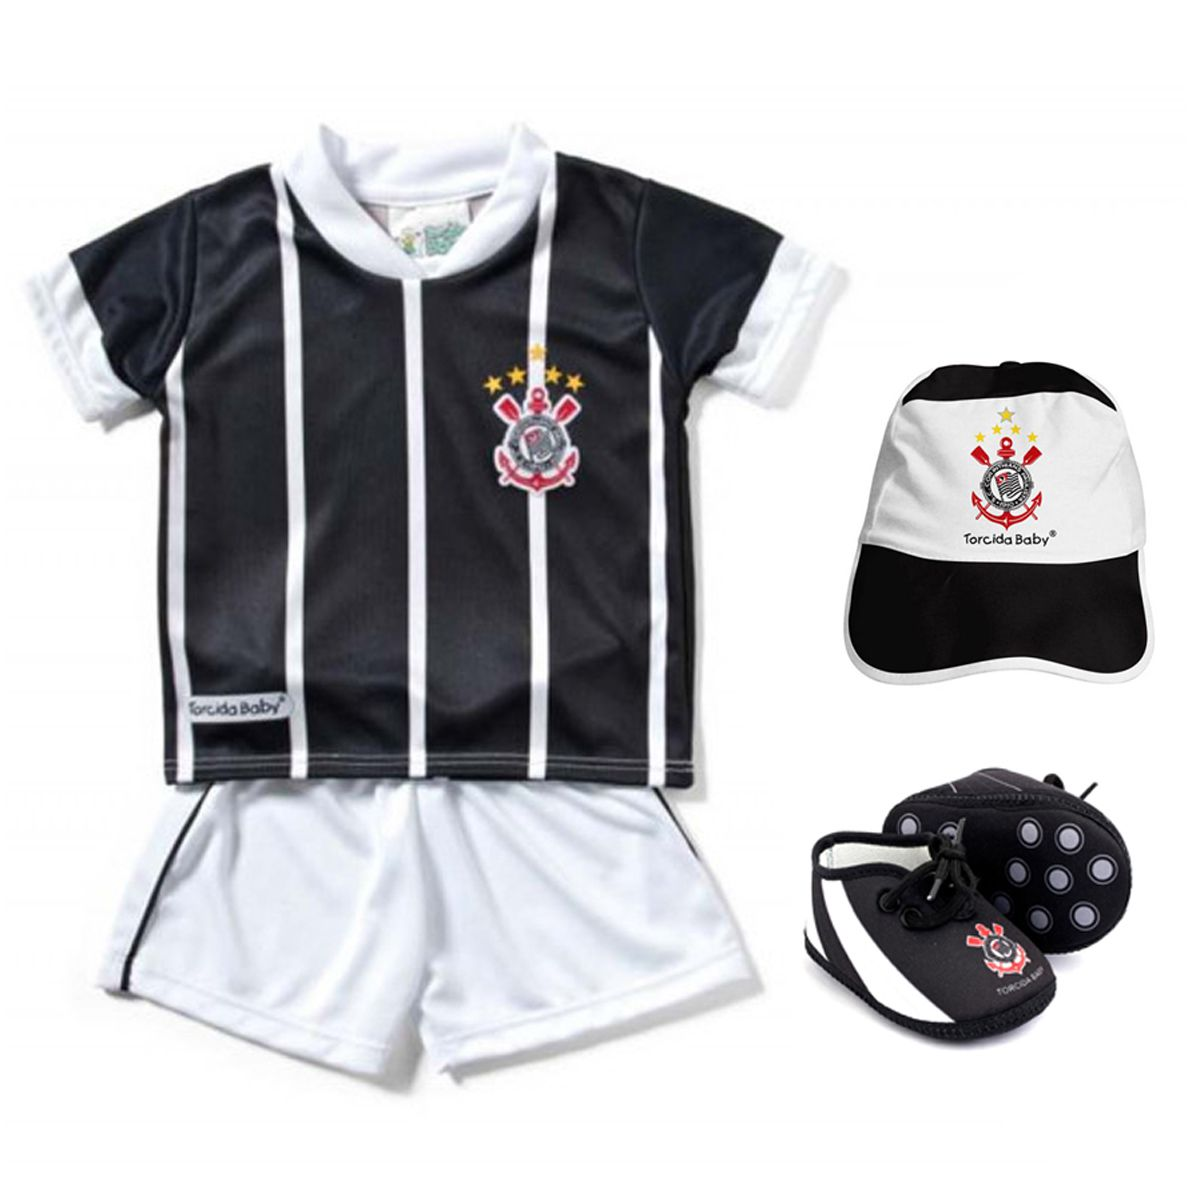 Kit Uniforme Bebê do Corinthians Torcida Baby - 015s